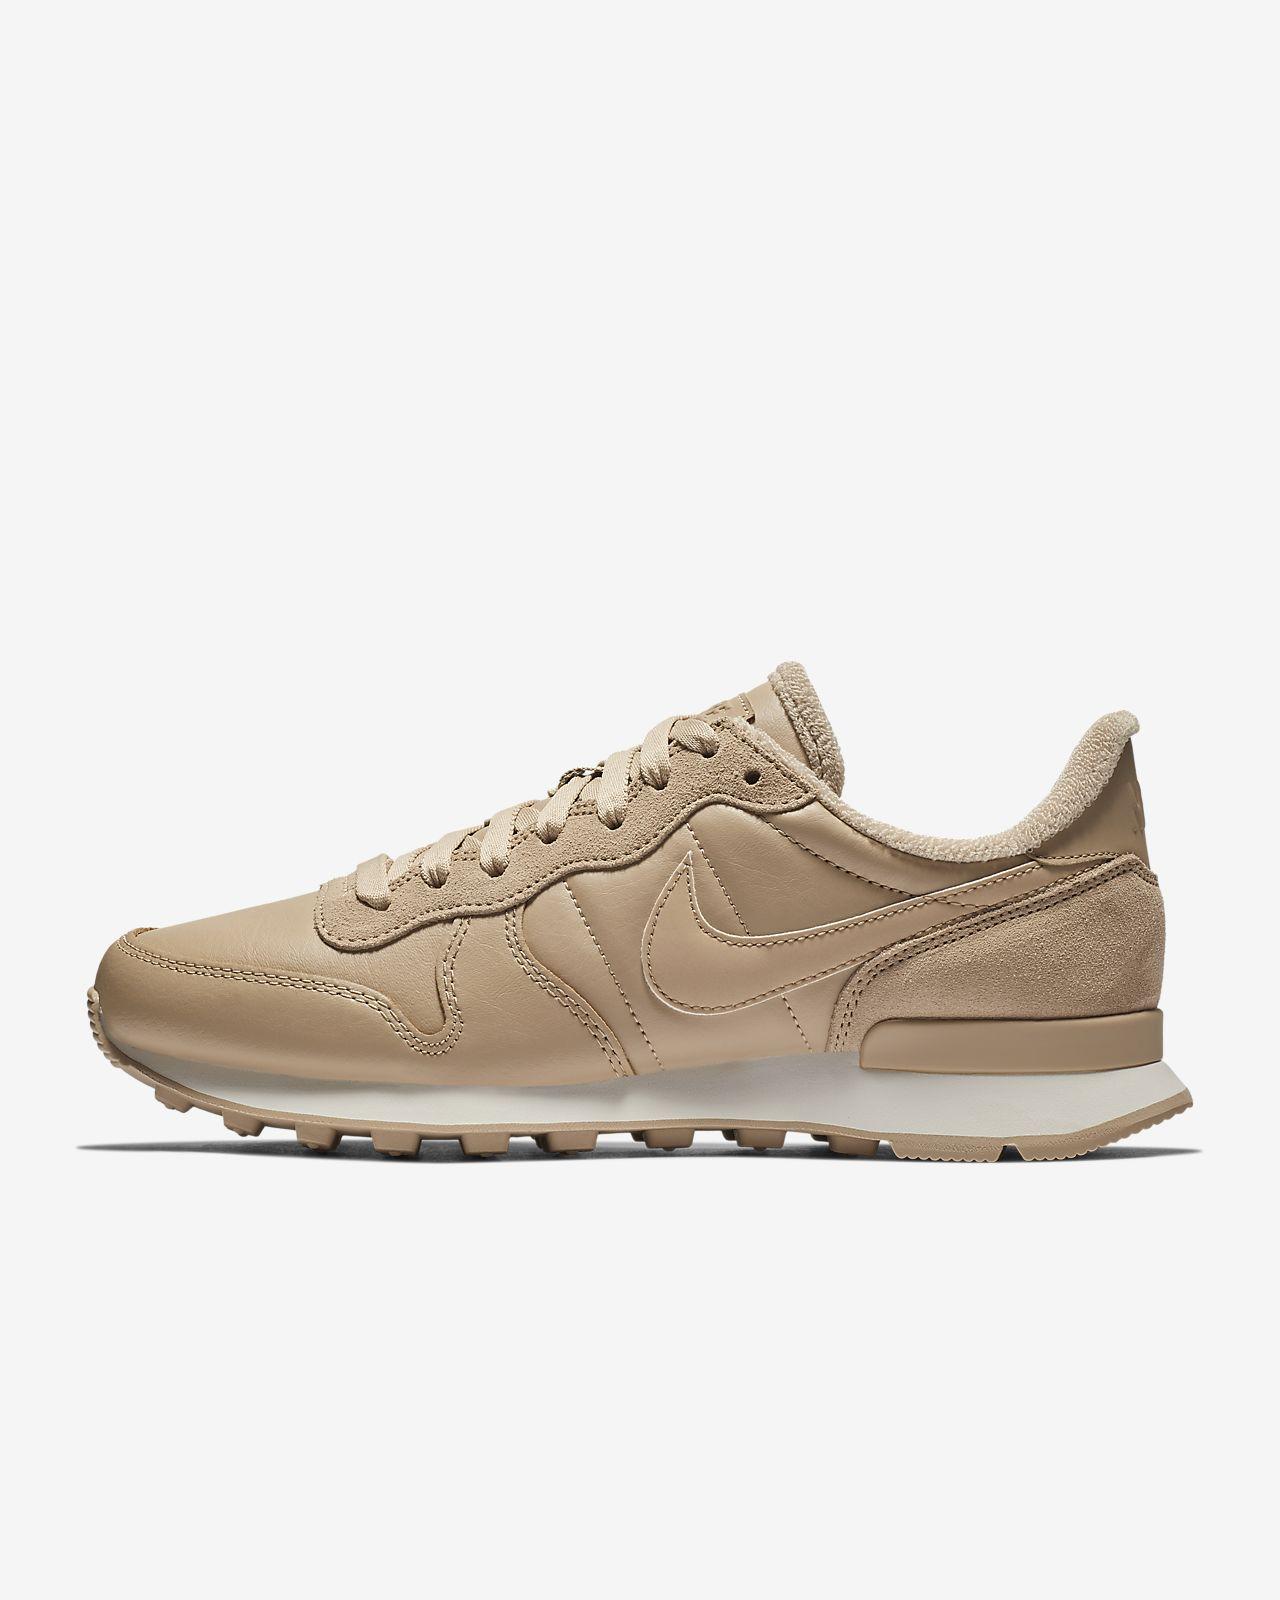 check out 816e3 6a56e Scarpa Nike Internationalist Winterized - Donna